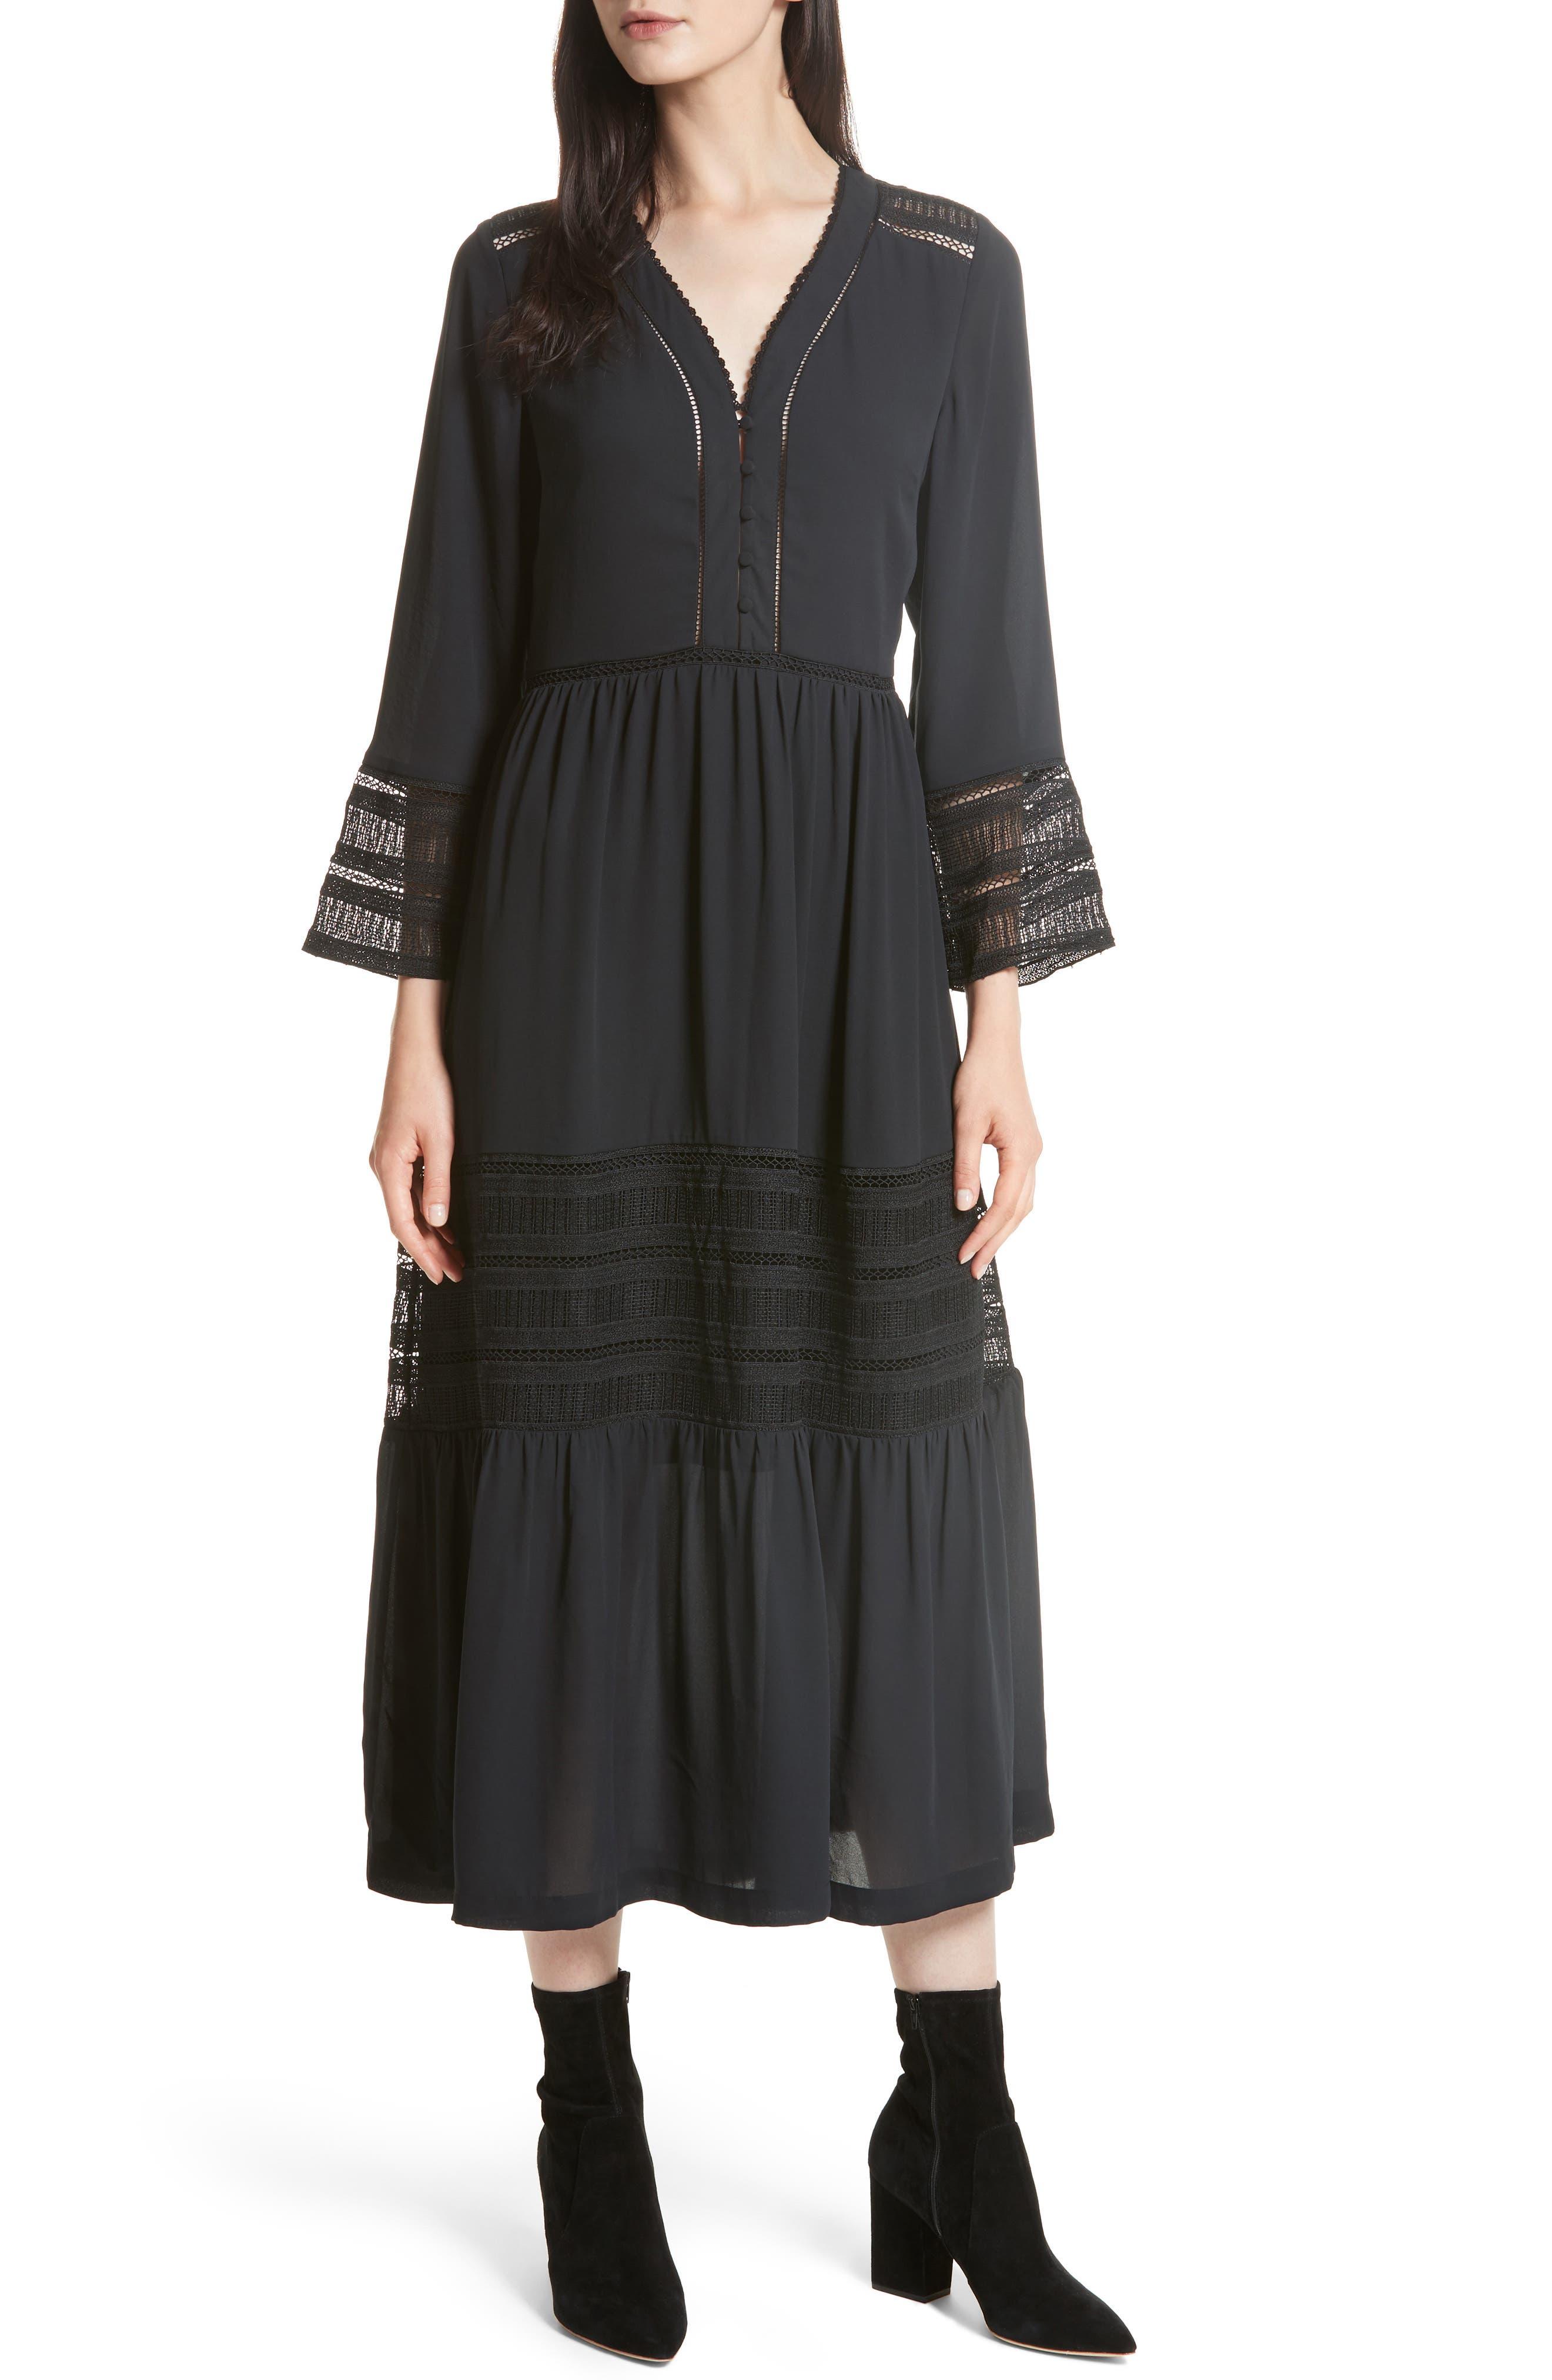 Alternate Image 1 Selected - Rebecca Minkoff Daphne A-Line Dress